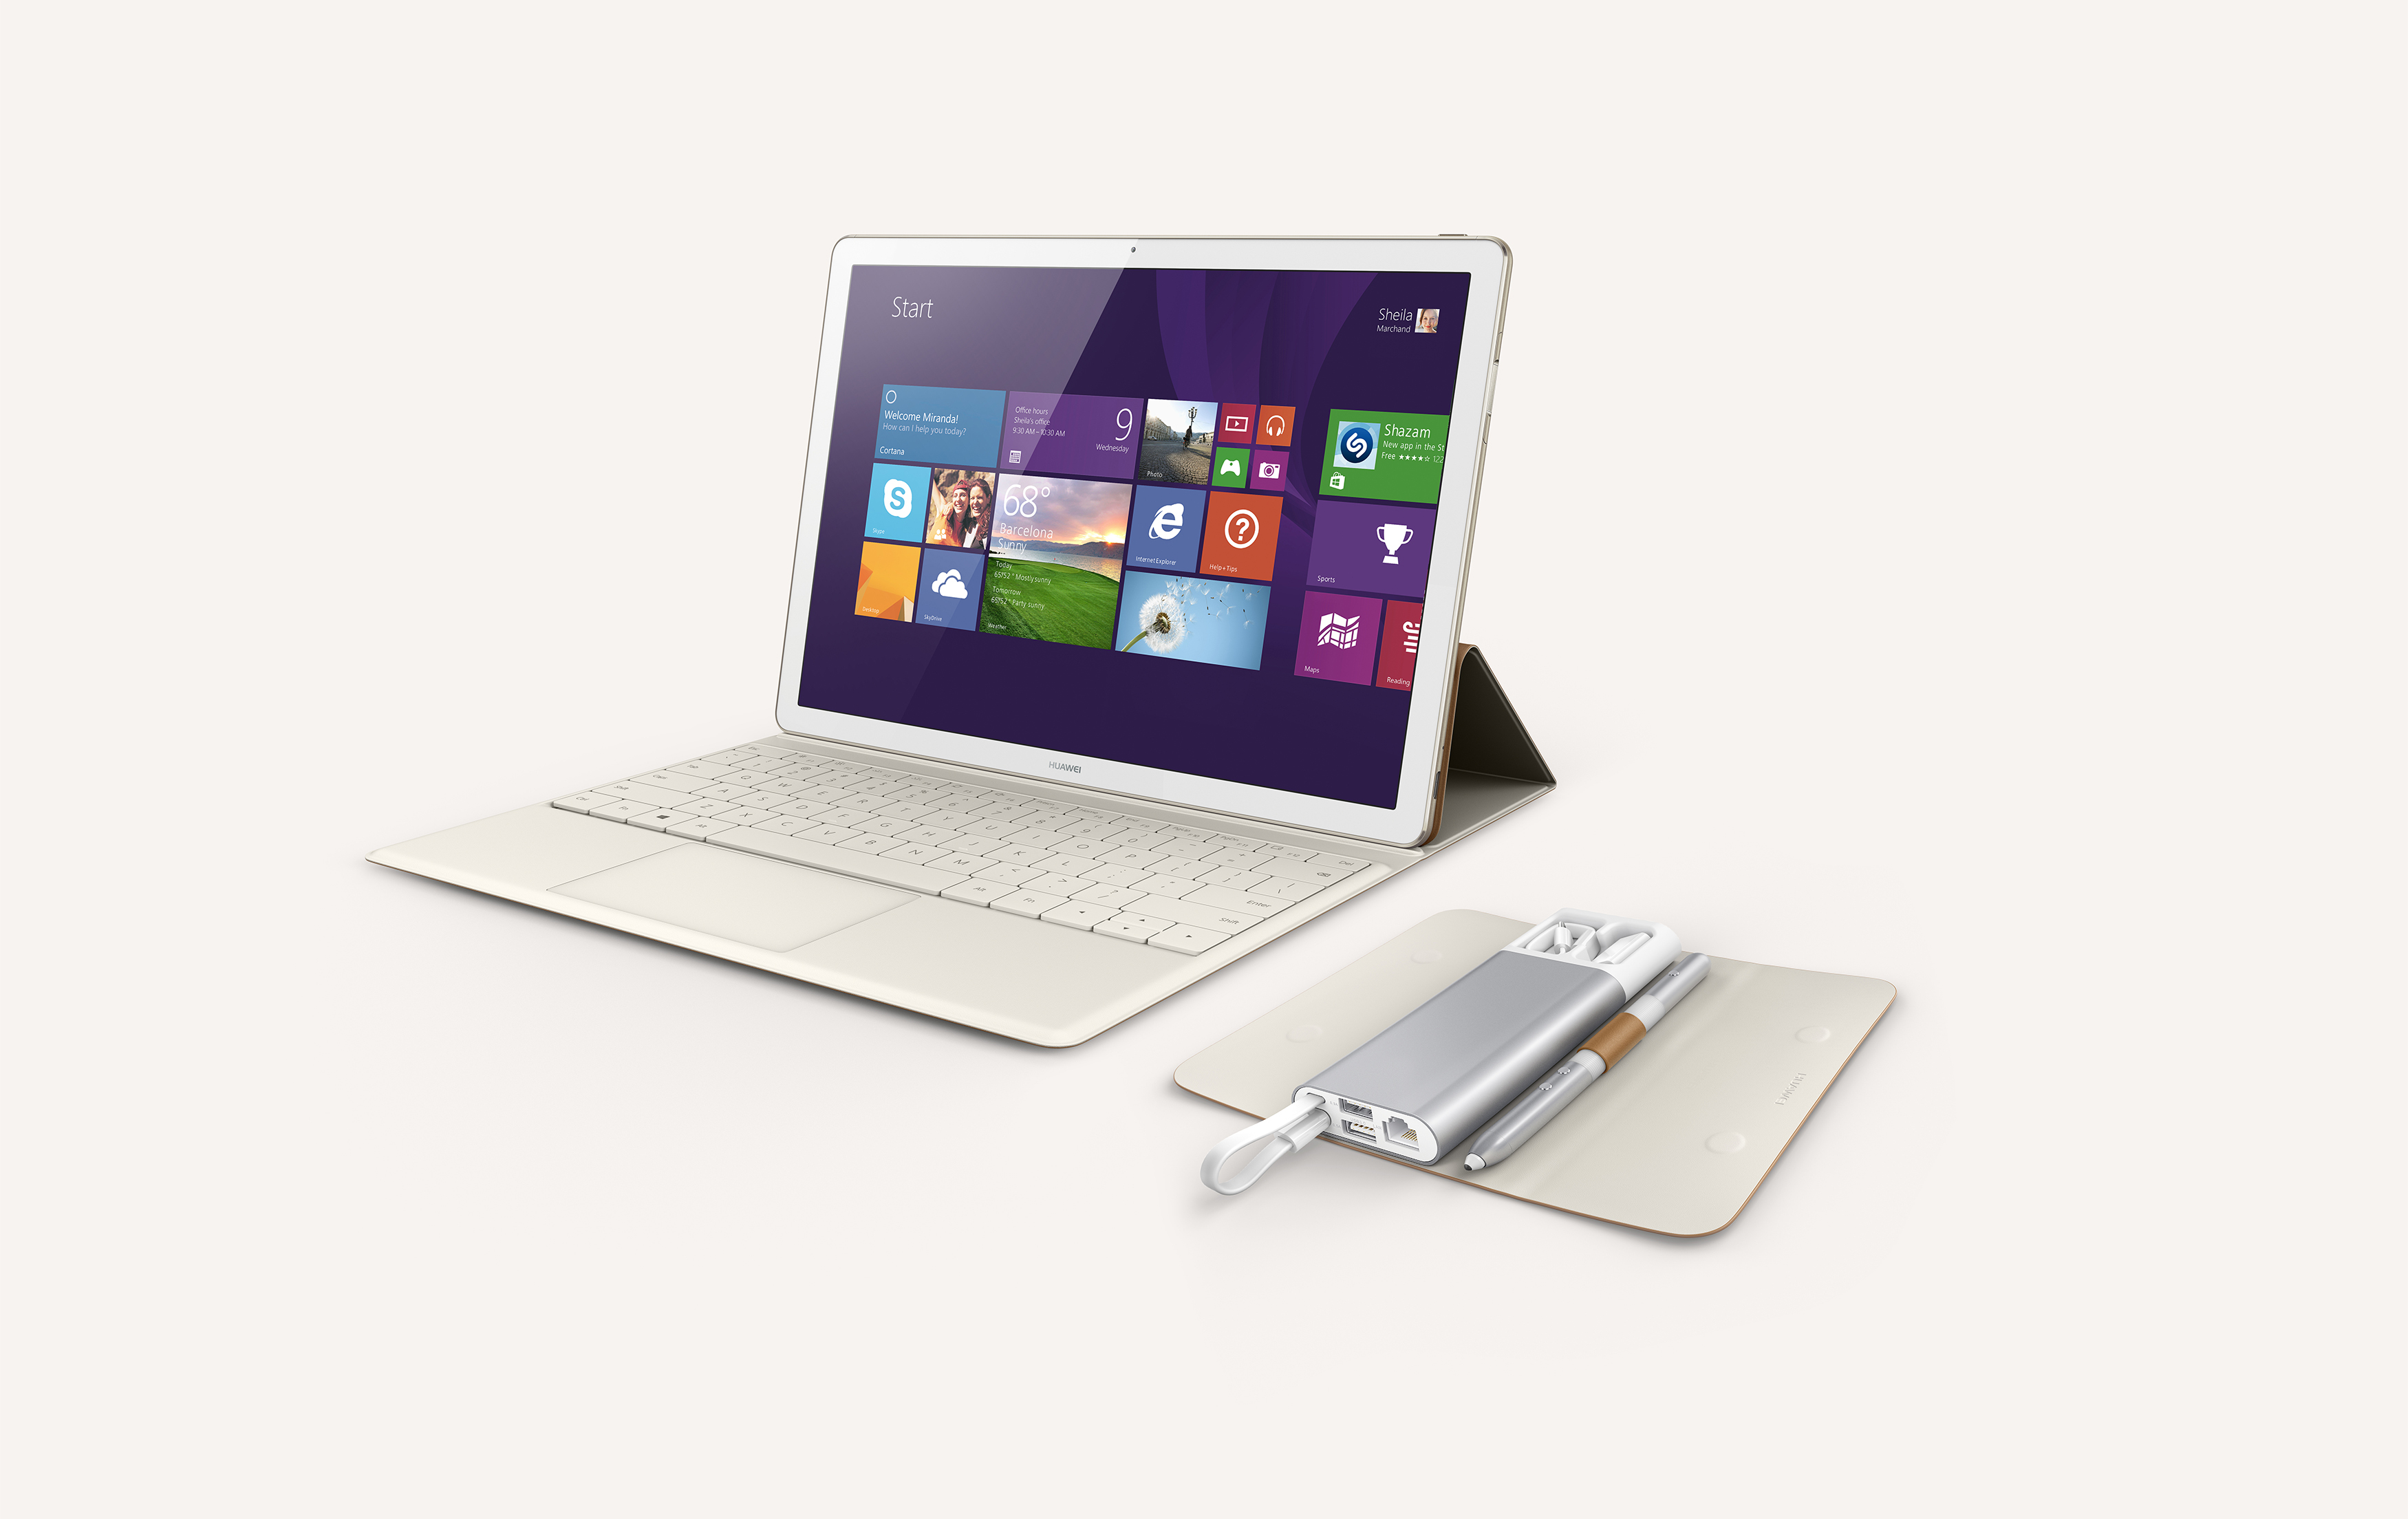 Huawei MateBook with Dock